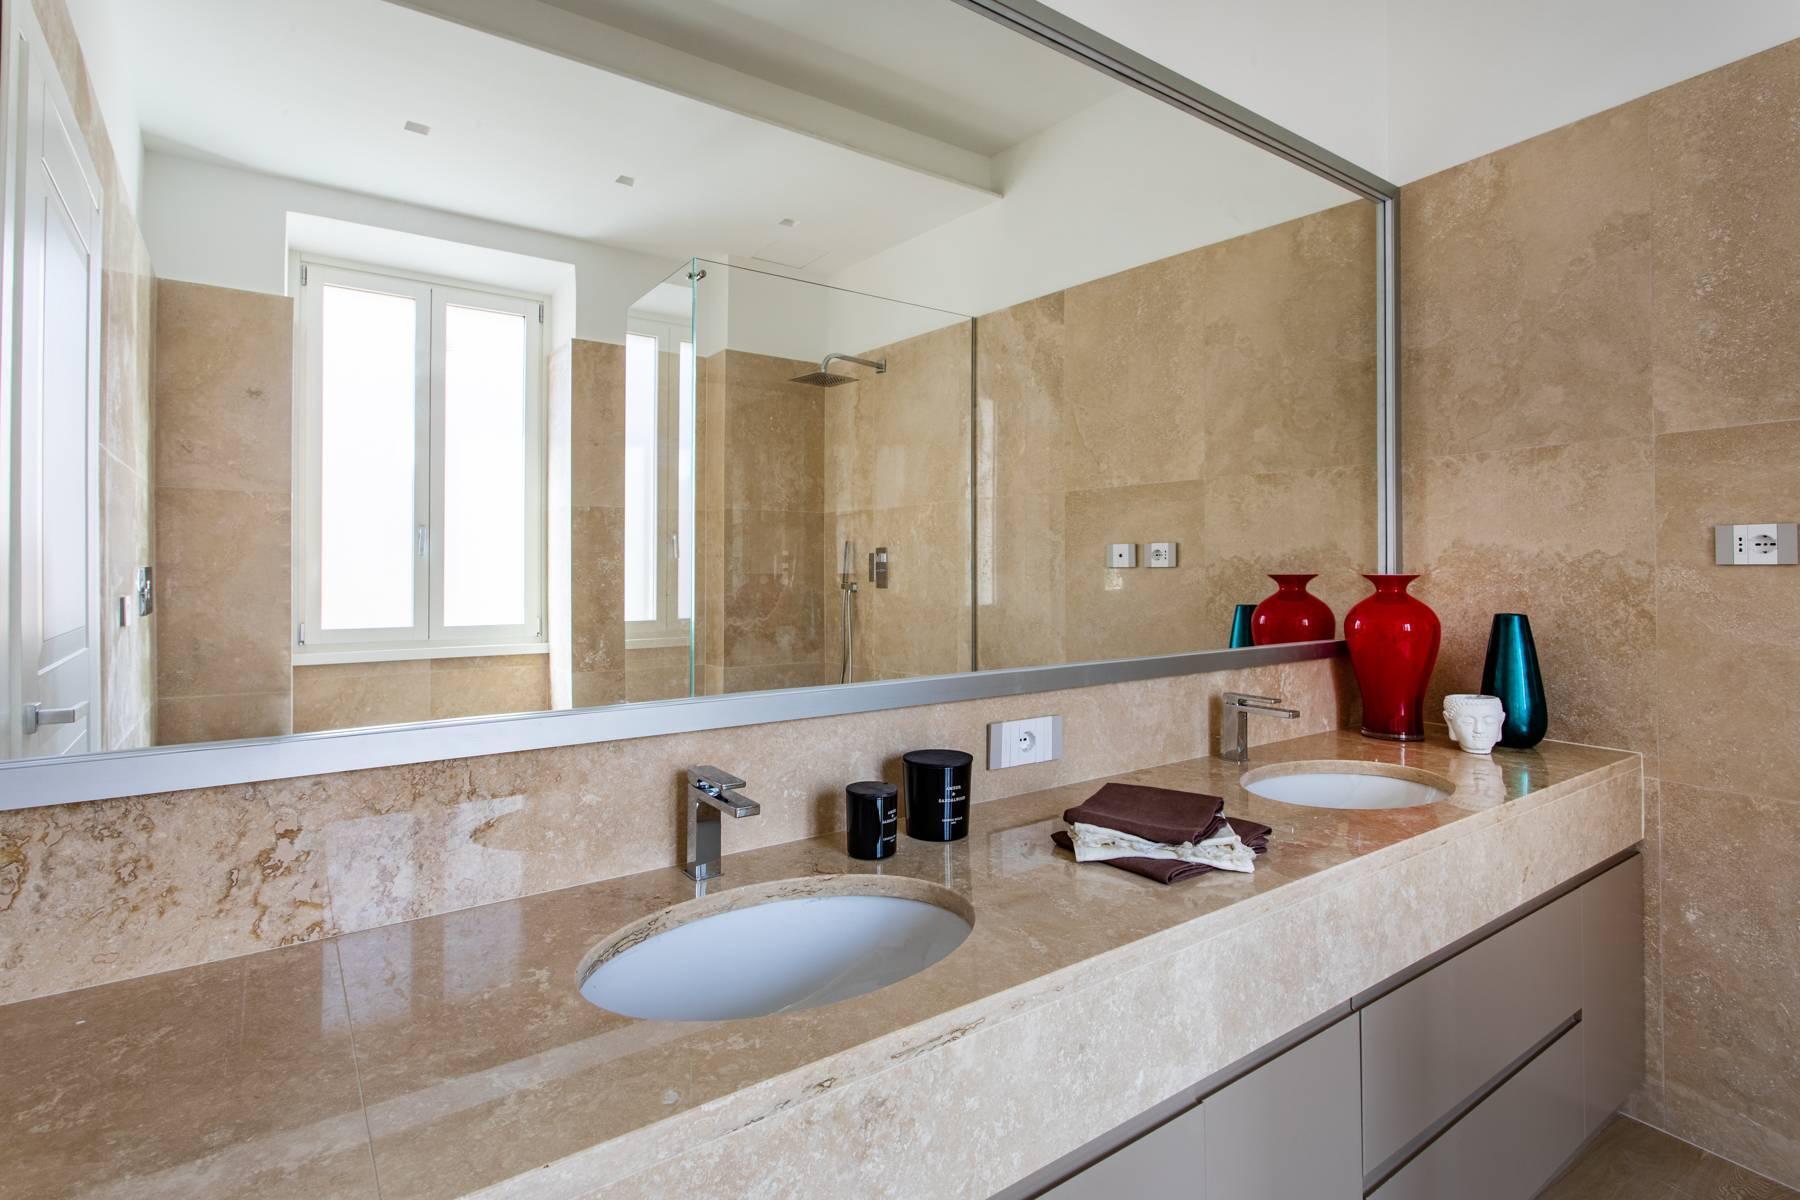 Spanish Steps luxury turnkey apartment - 16